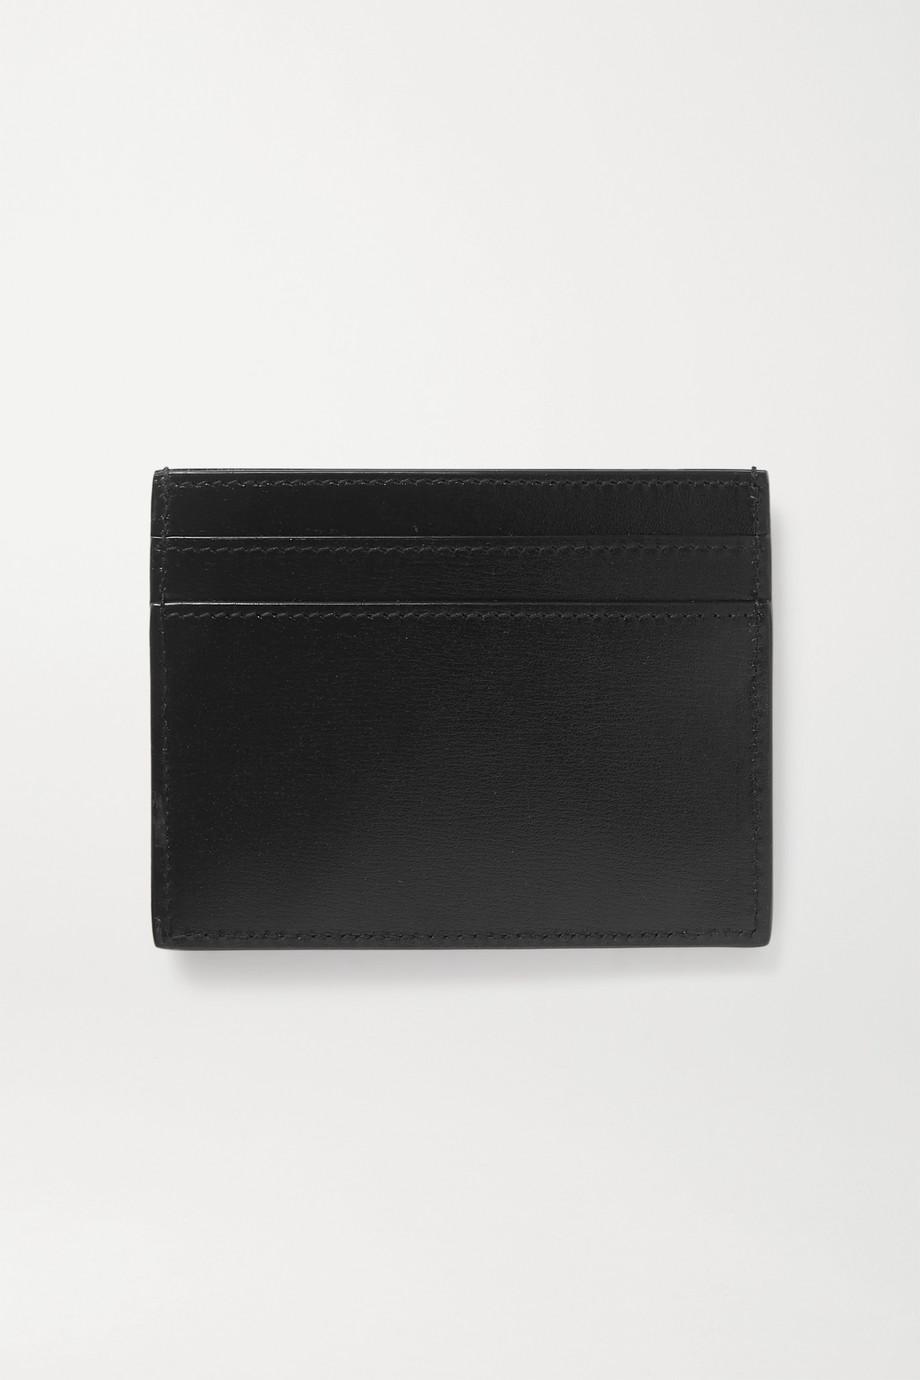 SAINT LAURENT Monogramme leather cardholder